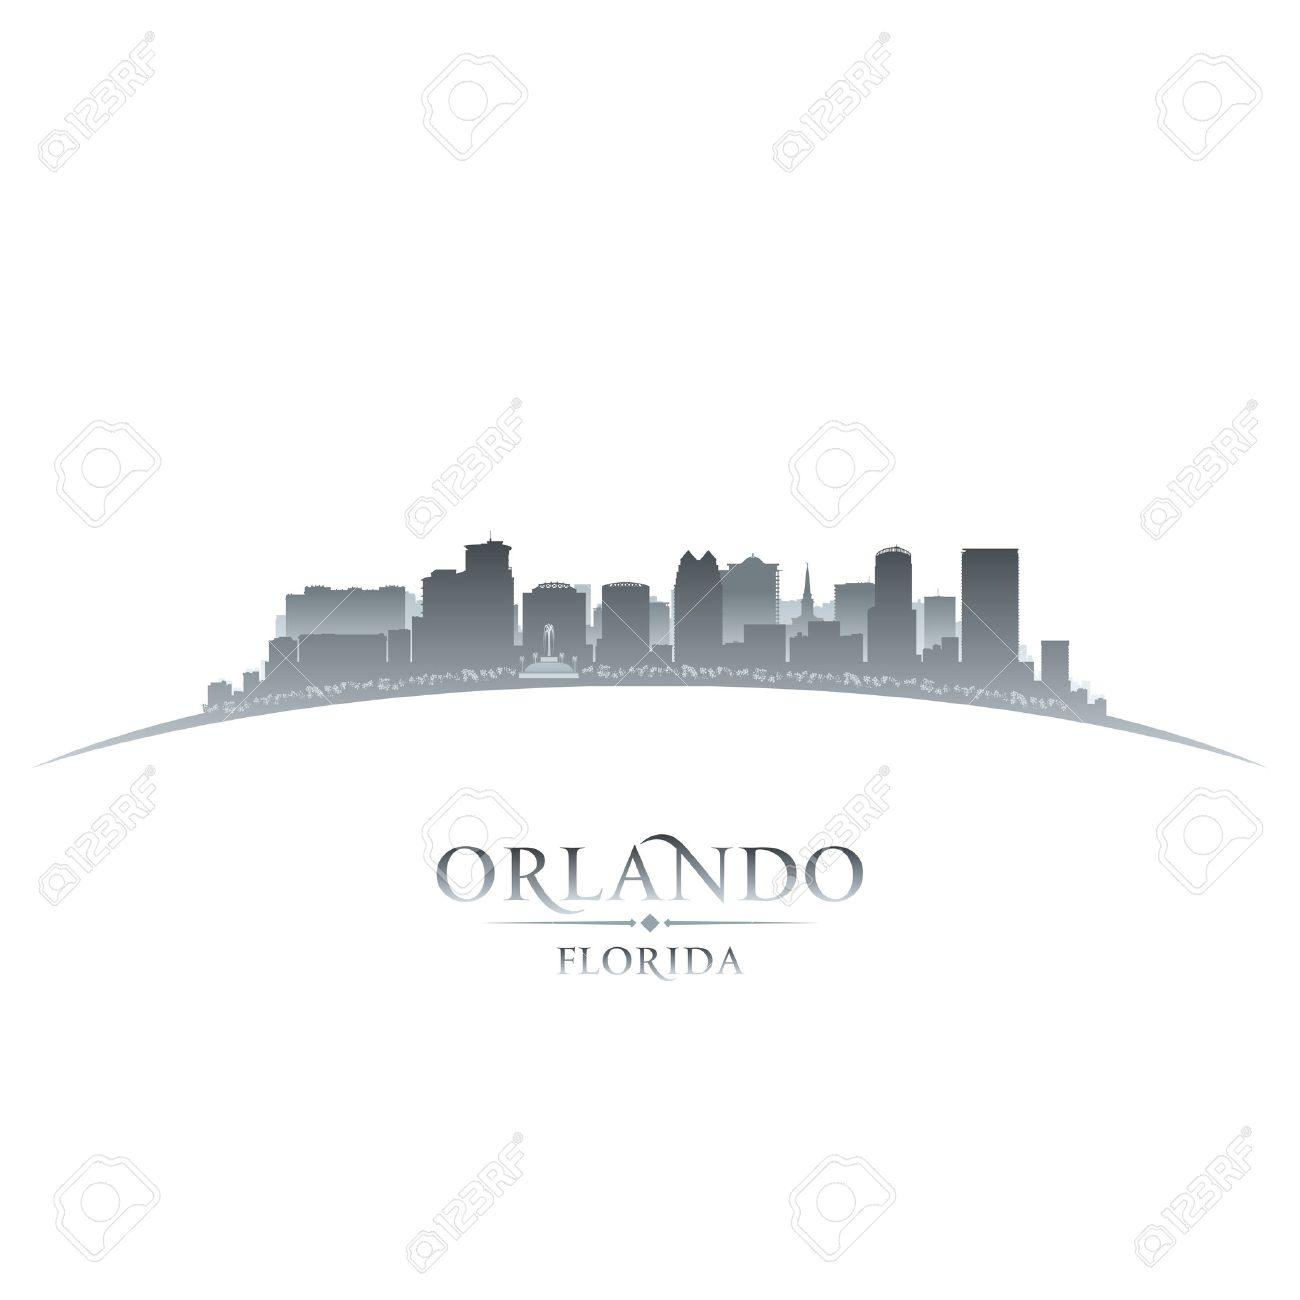 Orlando city skyline silhouette. Vector illustration Stock Vector - 24750985